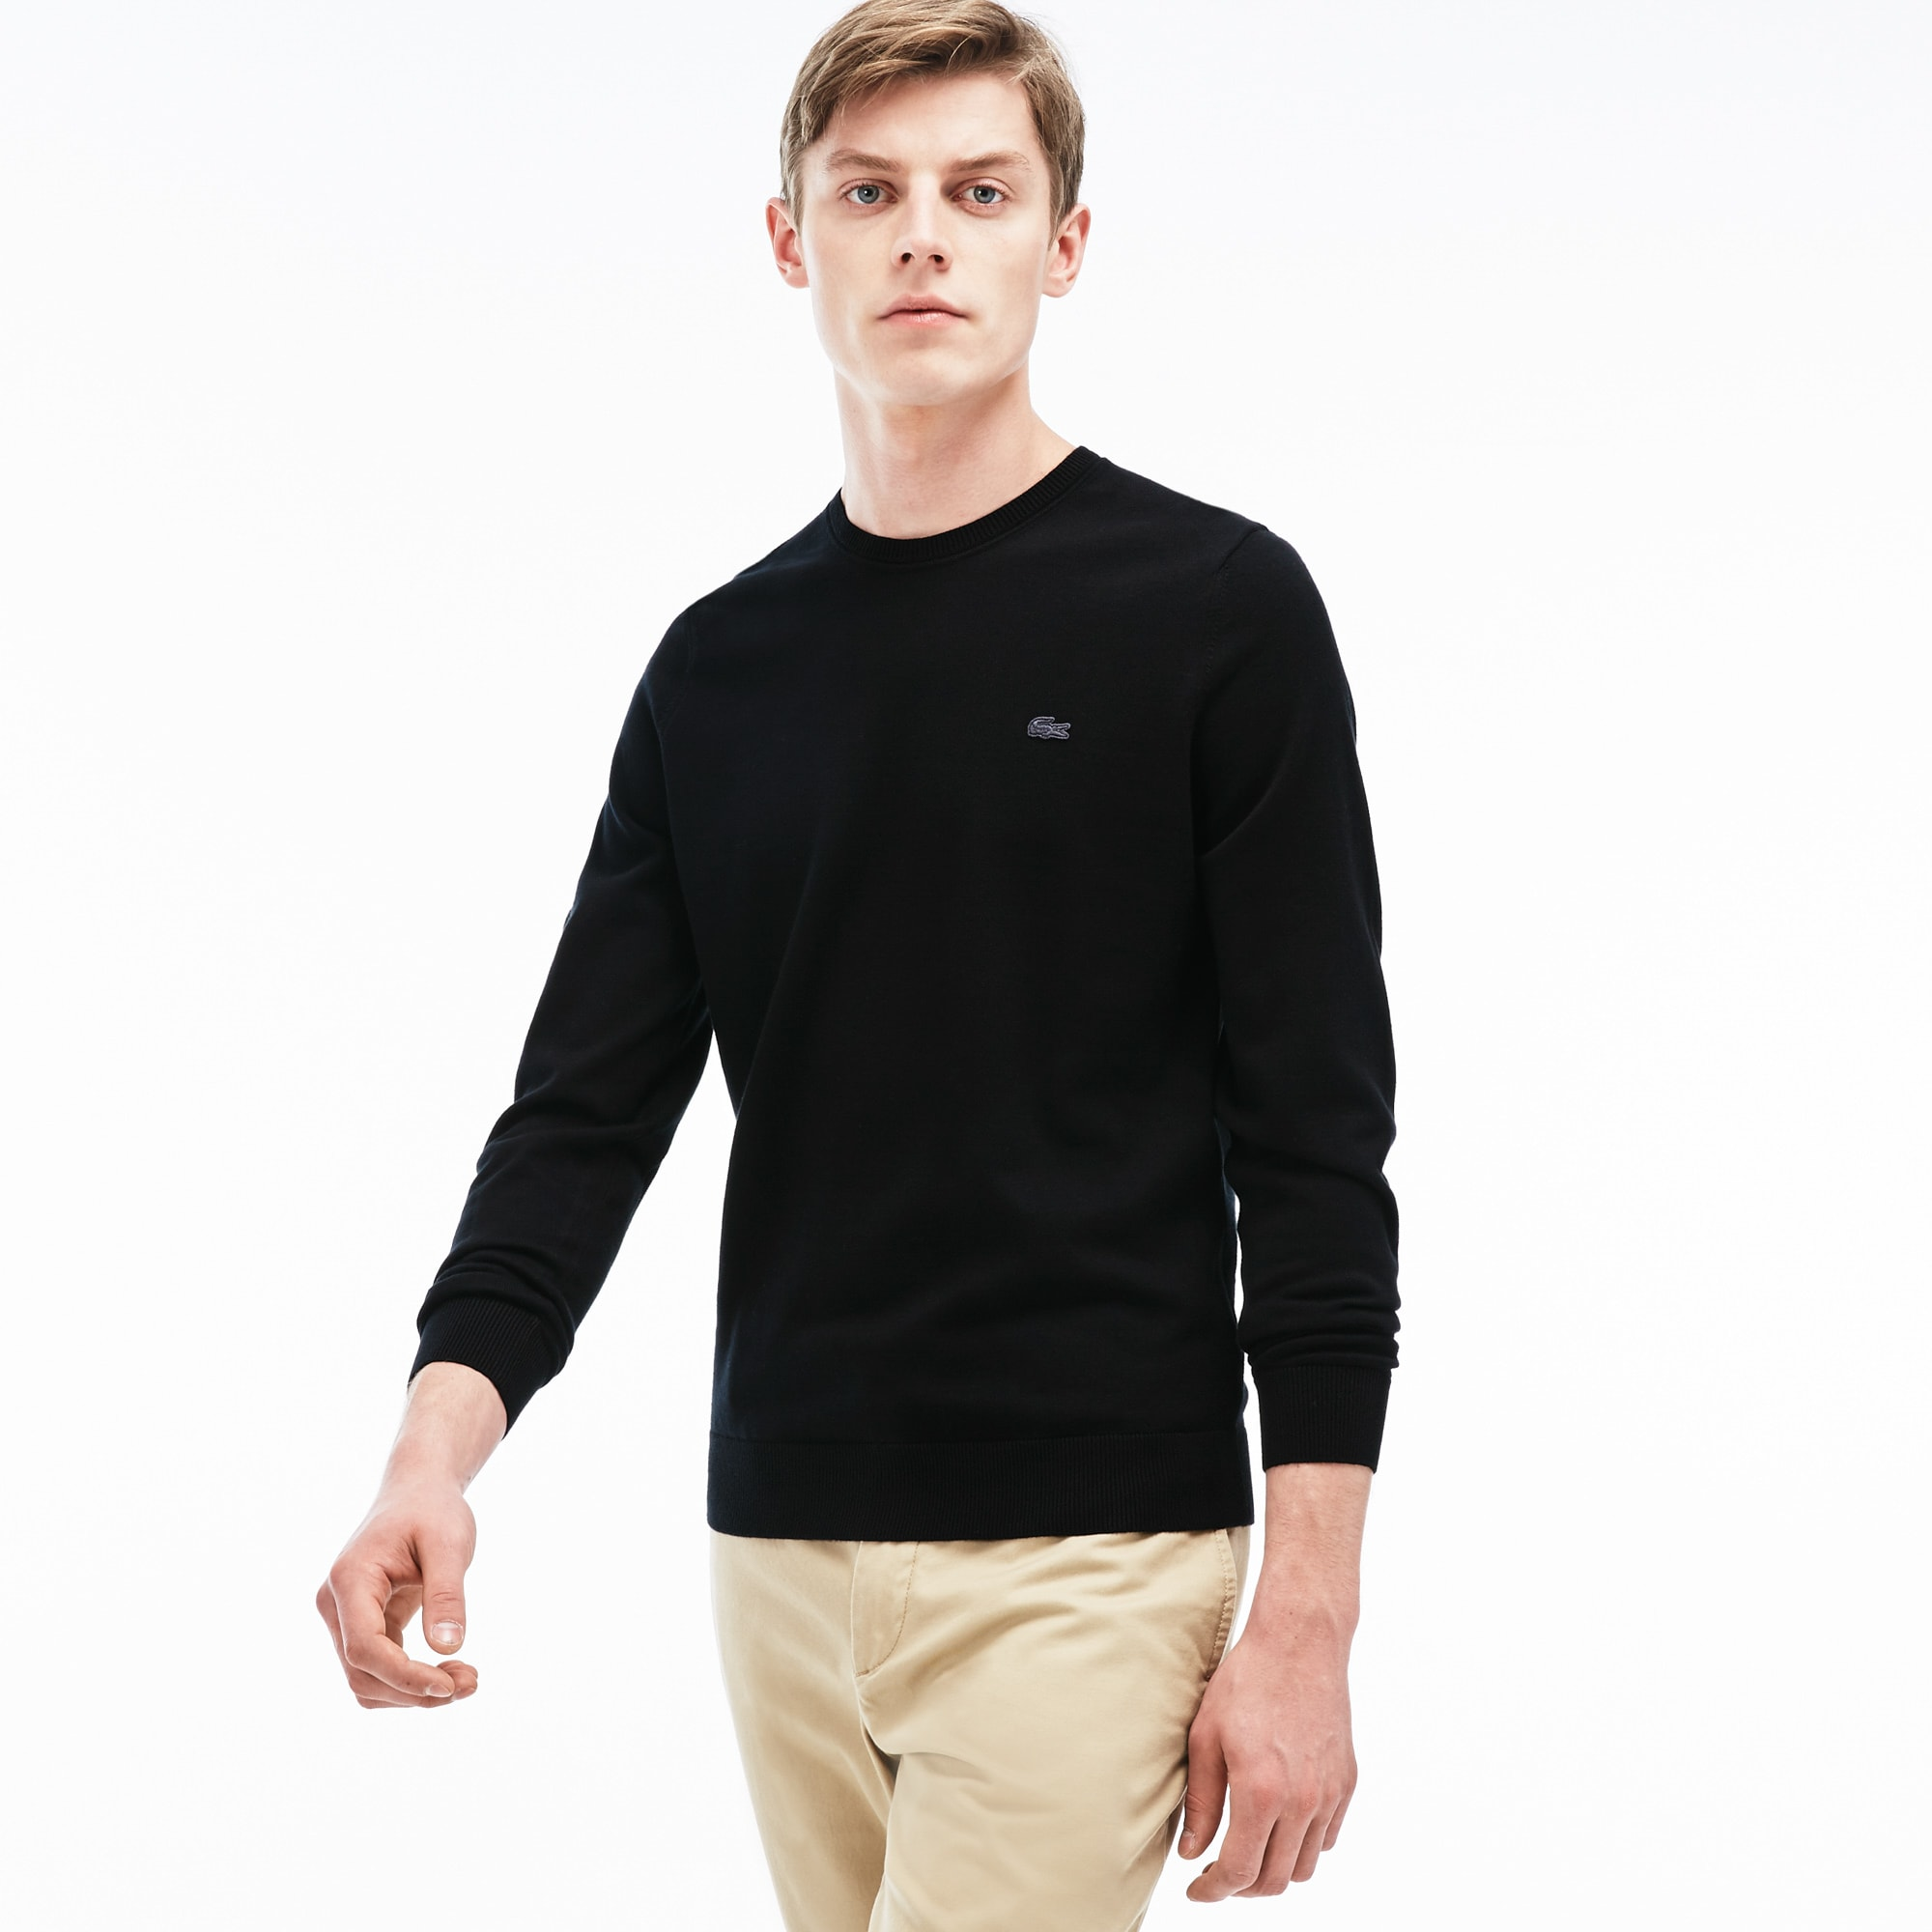 Men's Cotton Jersey Crewneck Sweater | LACOSTE